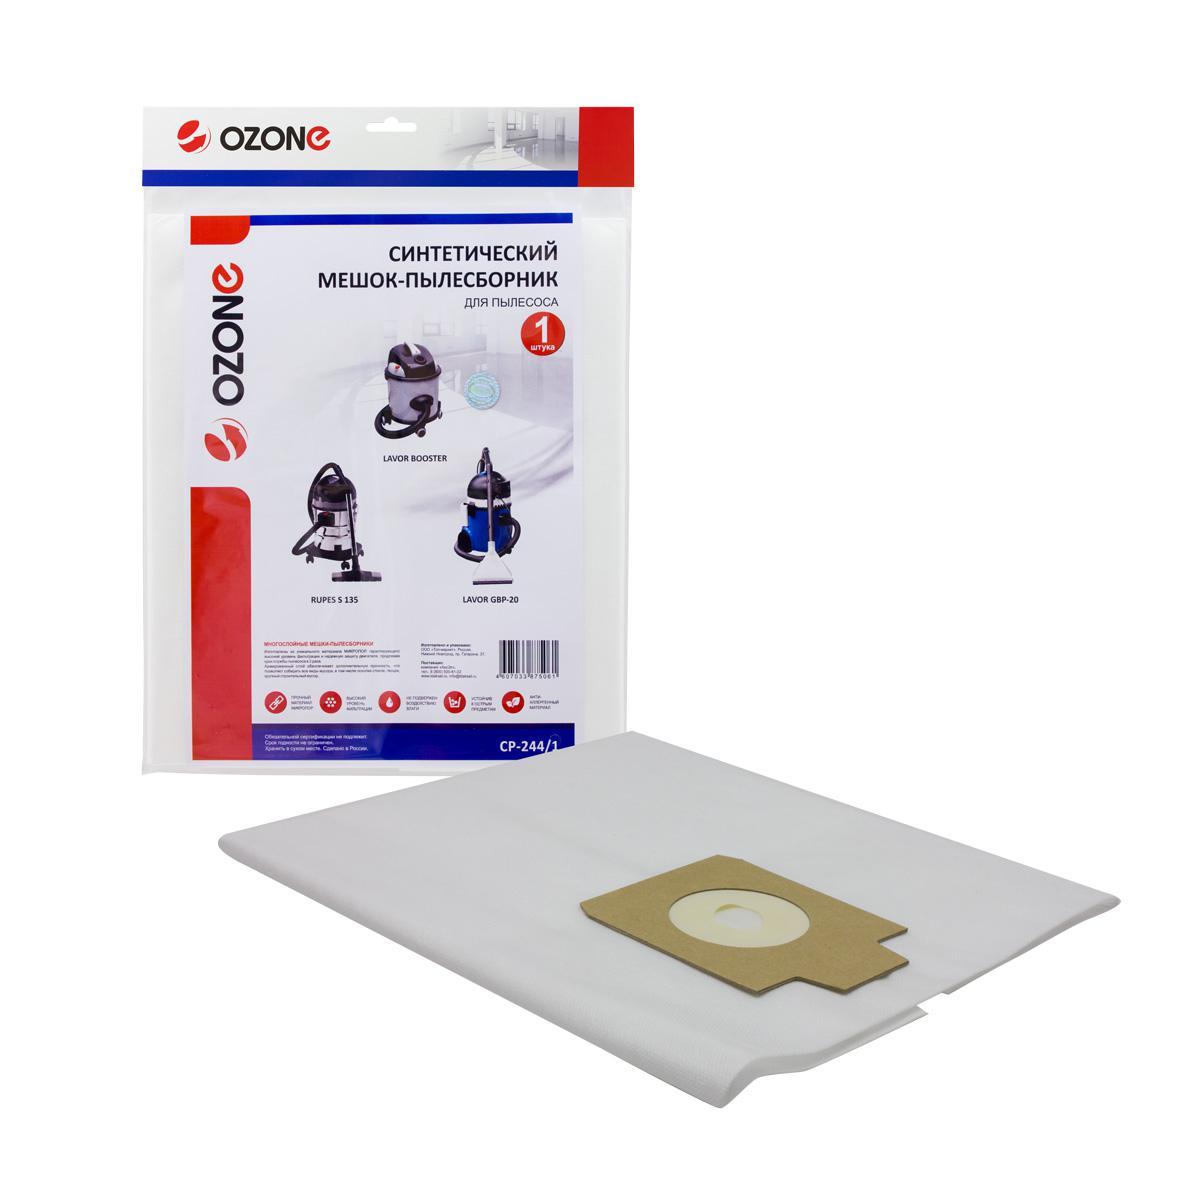 Мешок Ozone Cp-244/1 мешок ozone cp 210 5